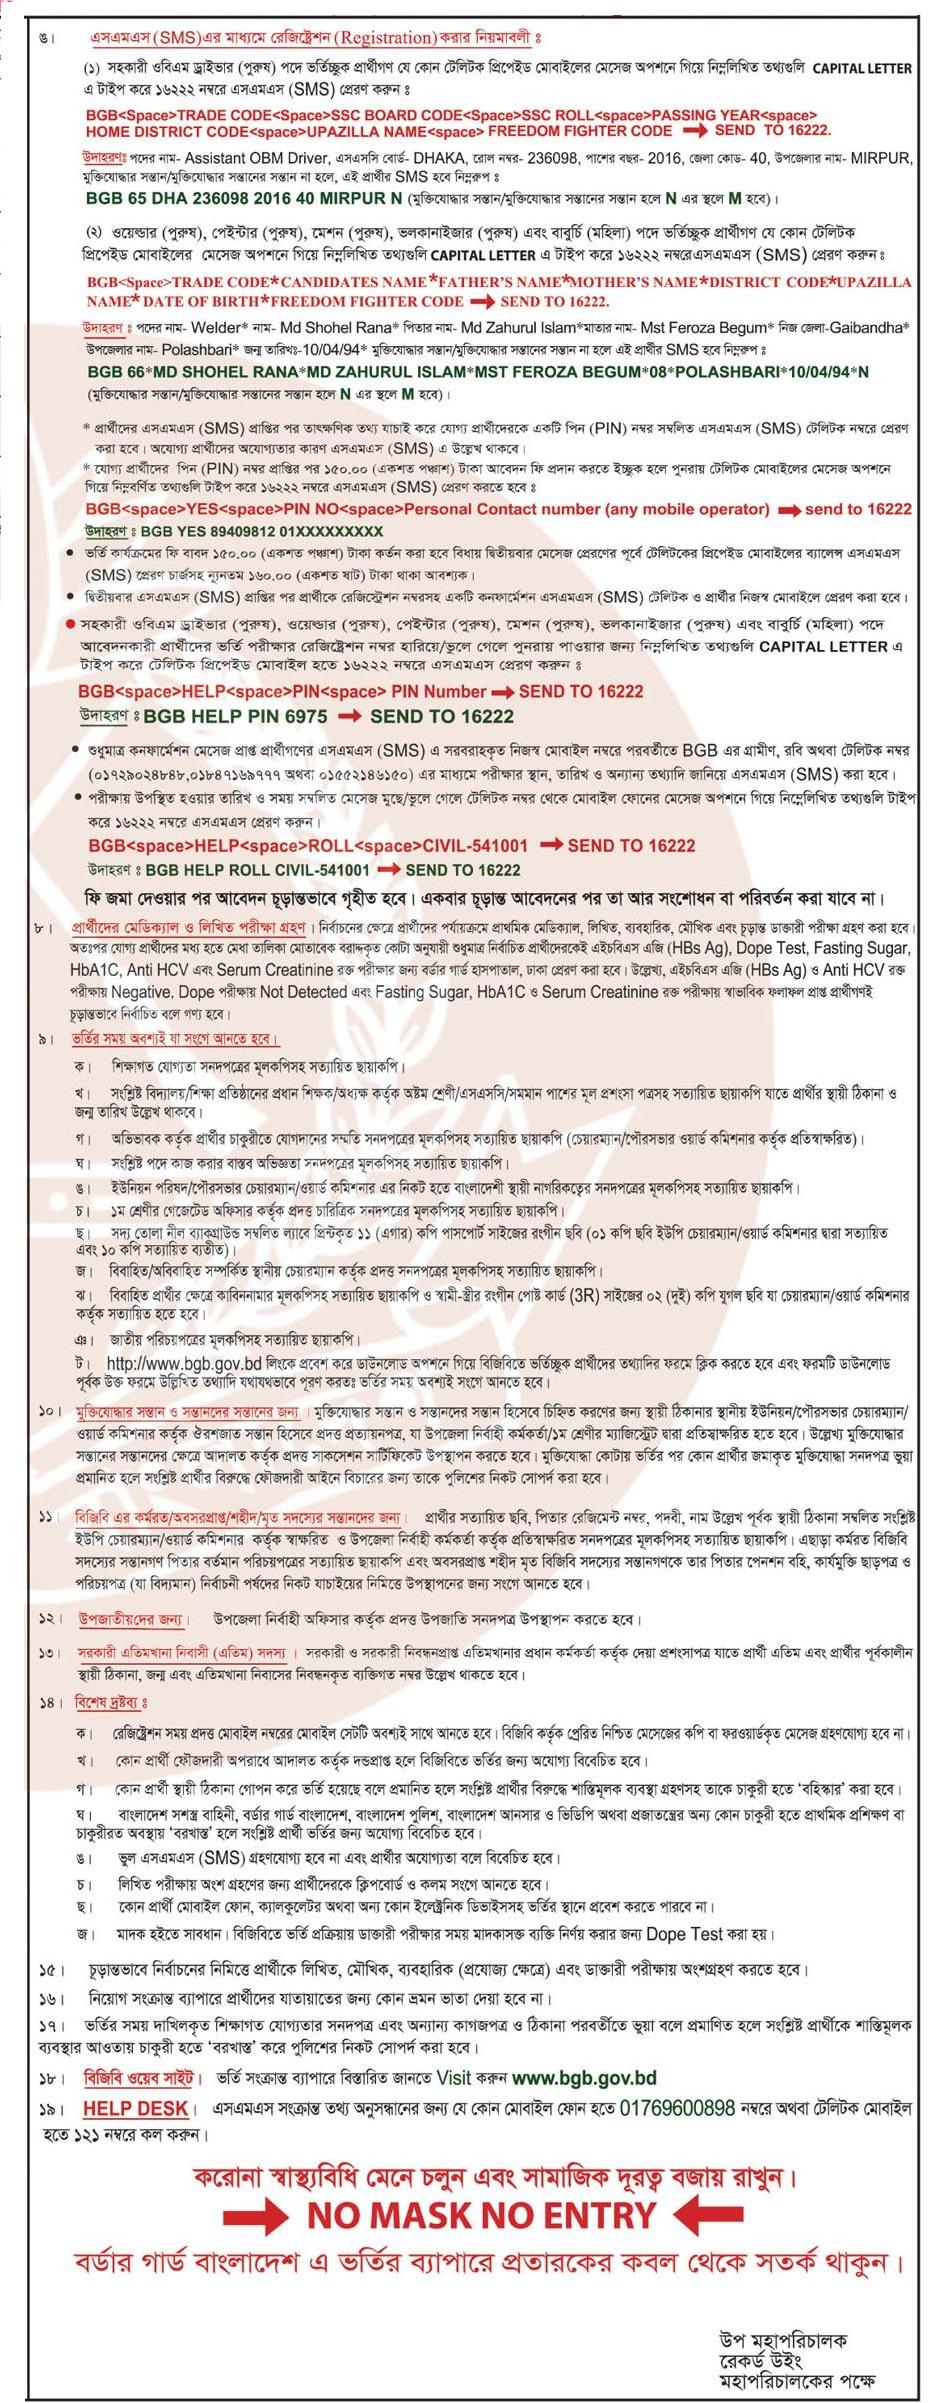 Border Guard Bangladesh BGB Civilian Job Circular 2021 -  বর্ডার গার্ড বাংলাদেশ (বিজিবি) অসামরিক নিয়োগ বিজ্ঞপ্তি ২০২১ - বিজিবি বেসামরিক পদে নিয়োগ বিজ্ঞপ্তি 2021